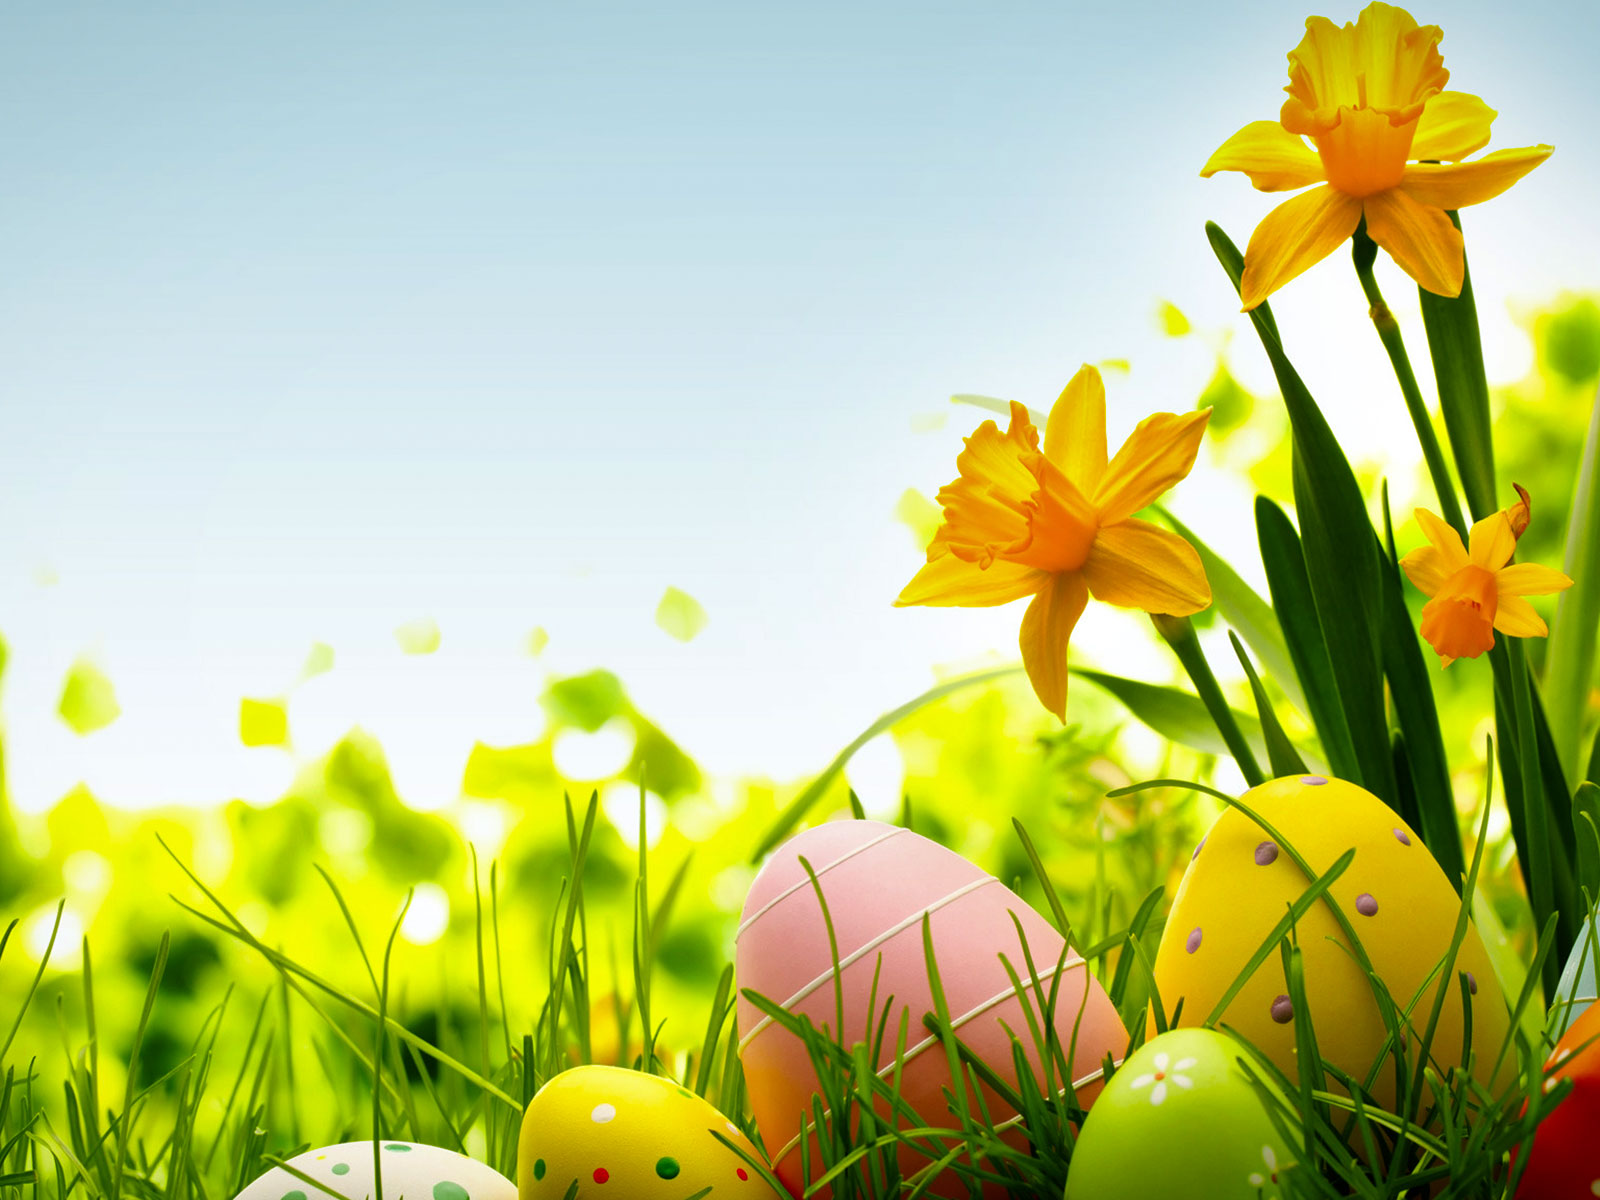 HDR Colorful Easter Egg Background.